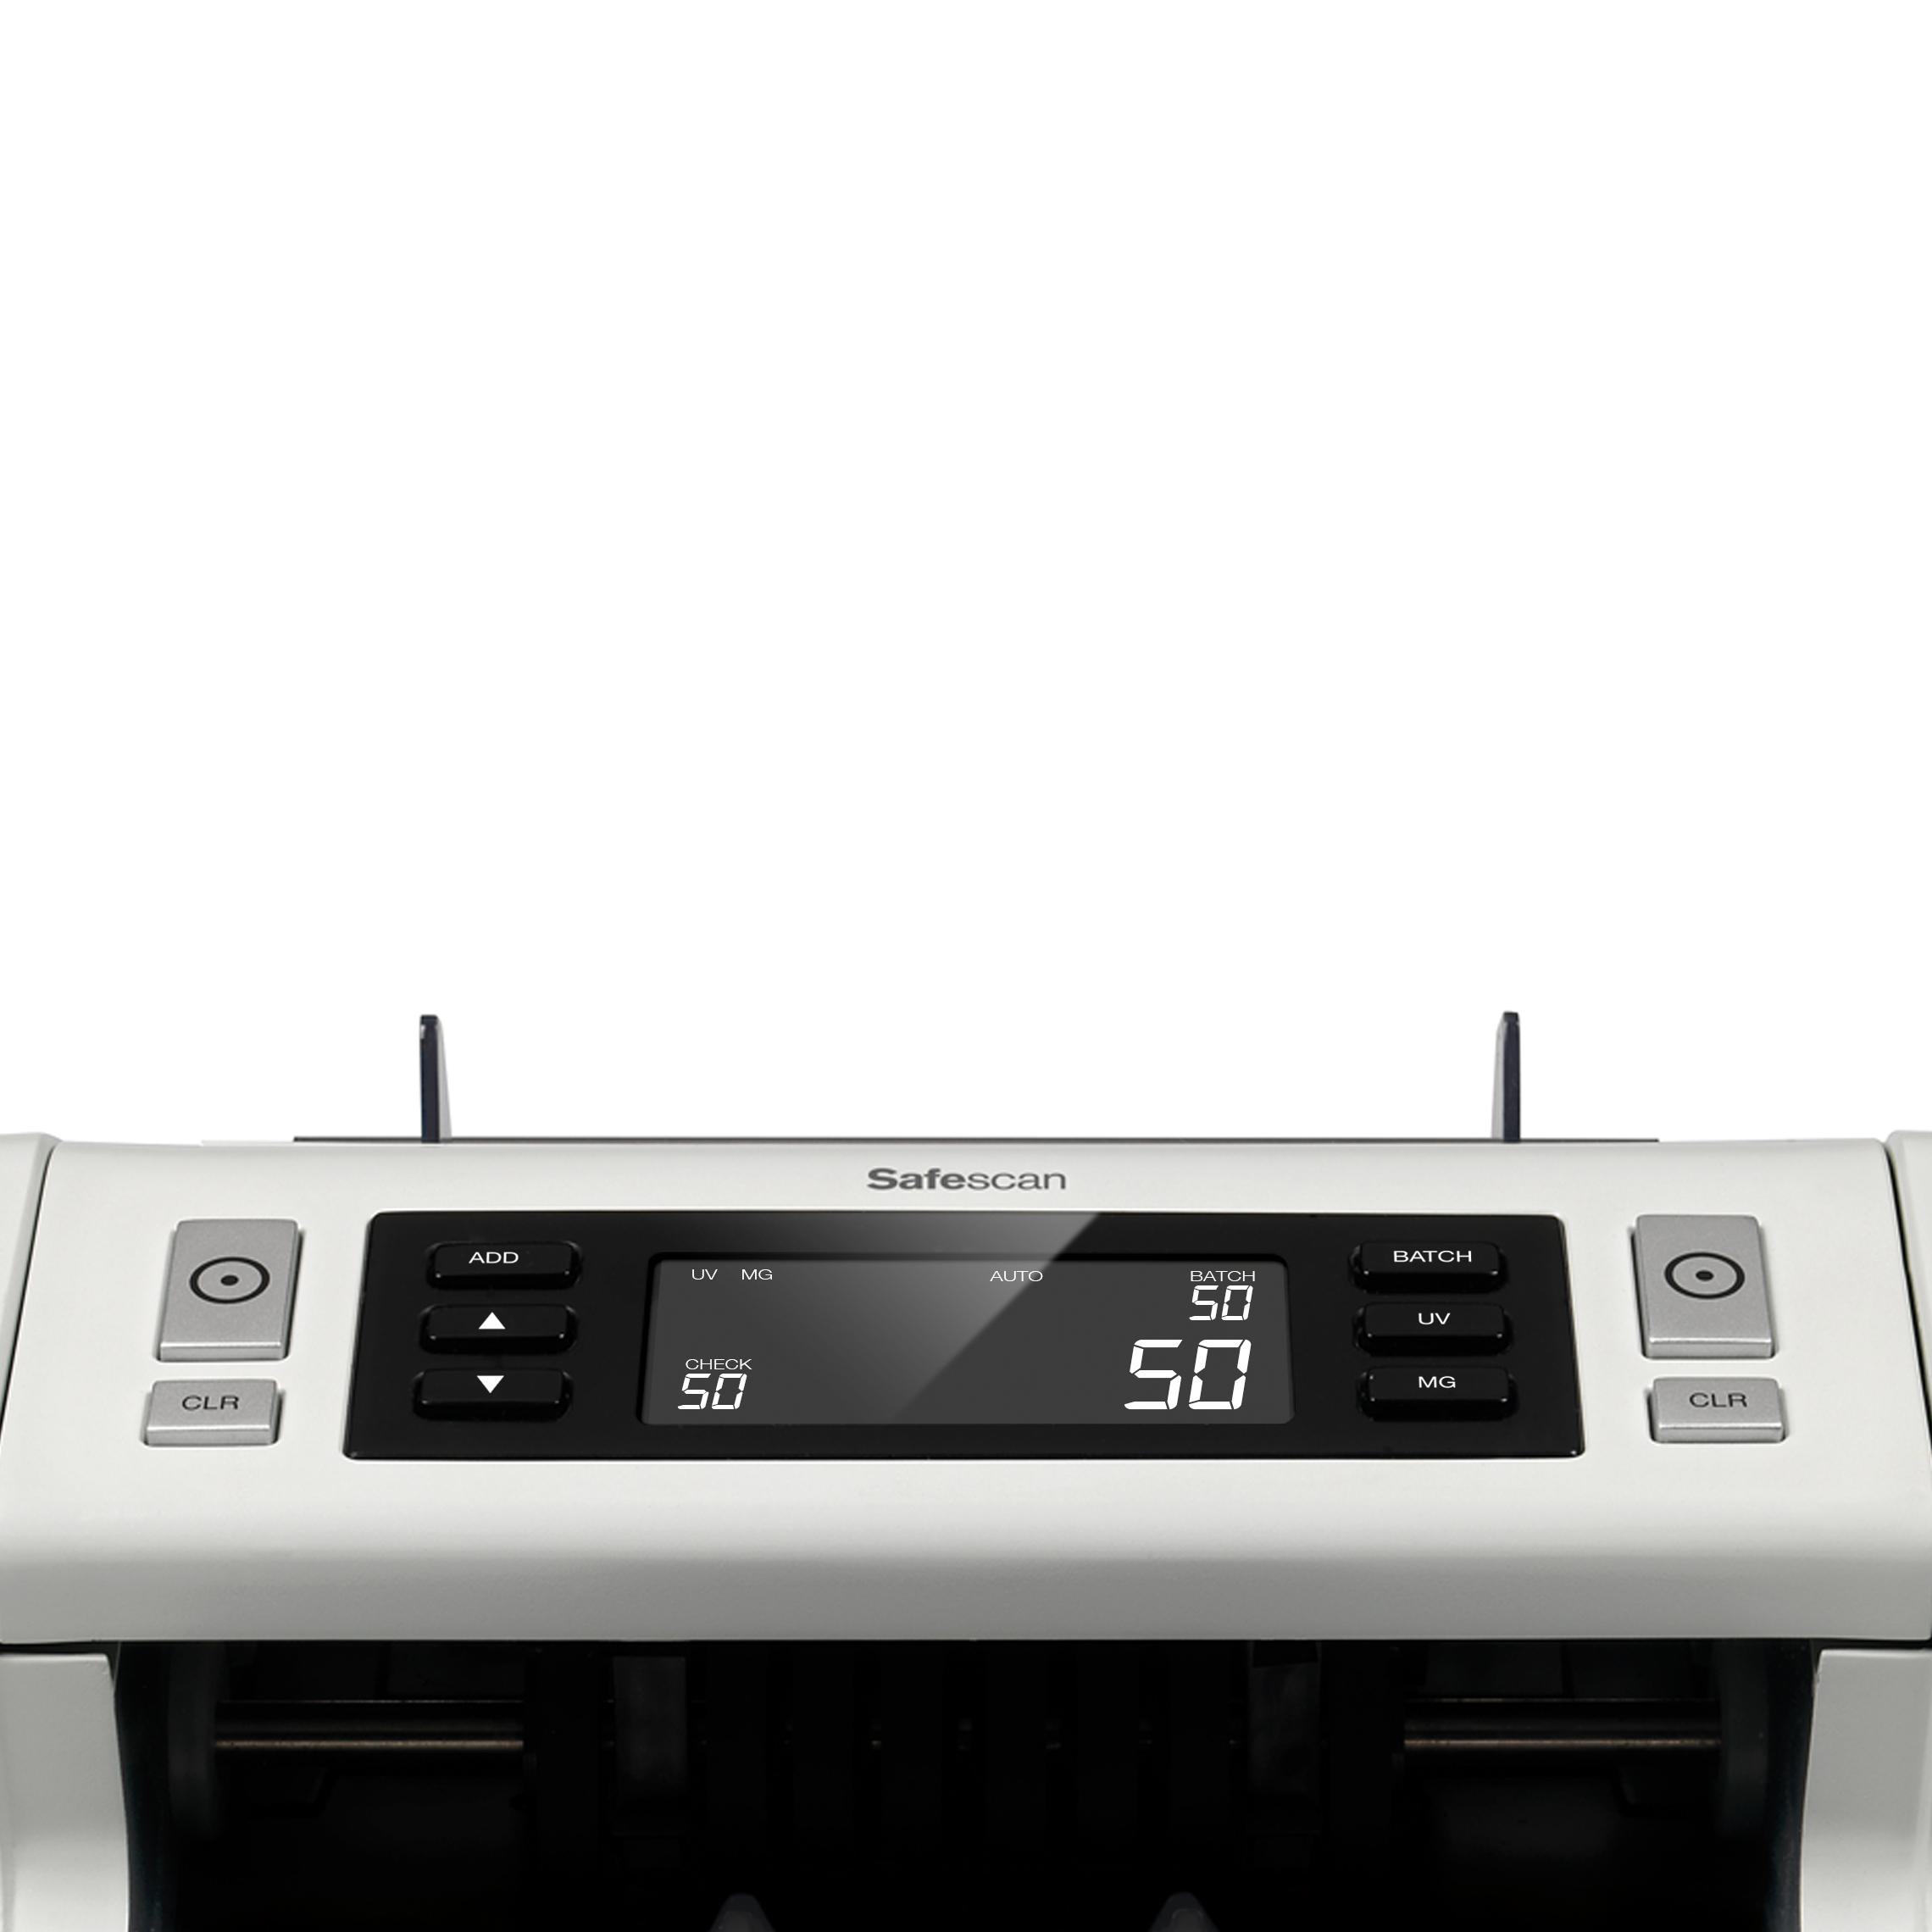 Safescan 2250 Banknote Counter & Checker 5.8kg L250xW295xH184mm Grey Ref 115-0561